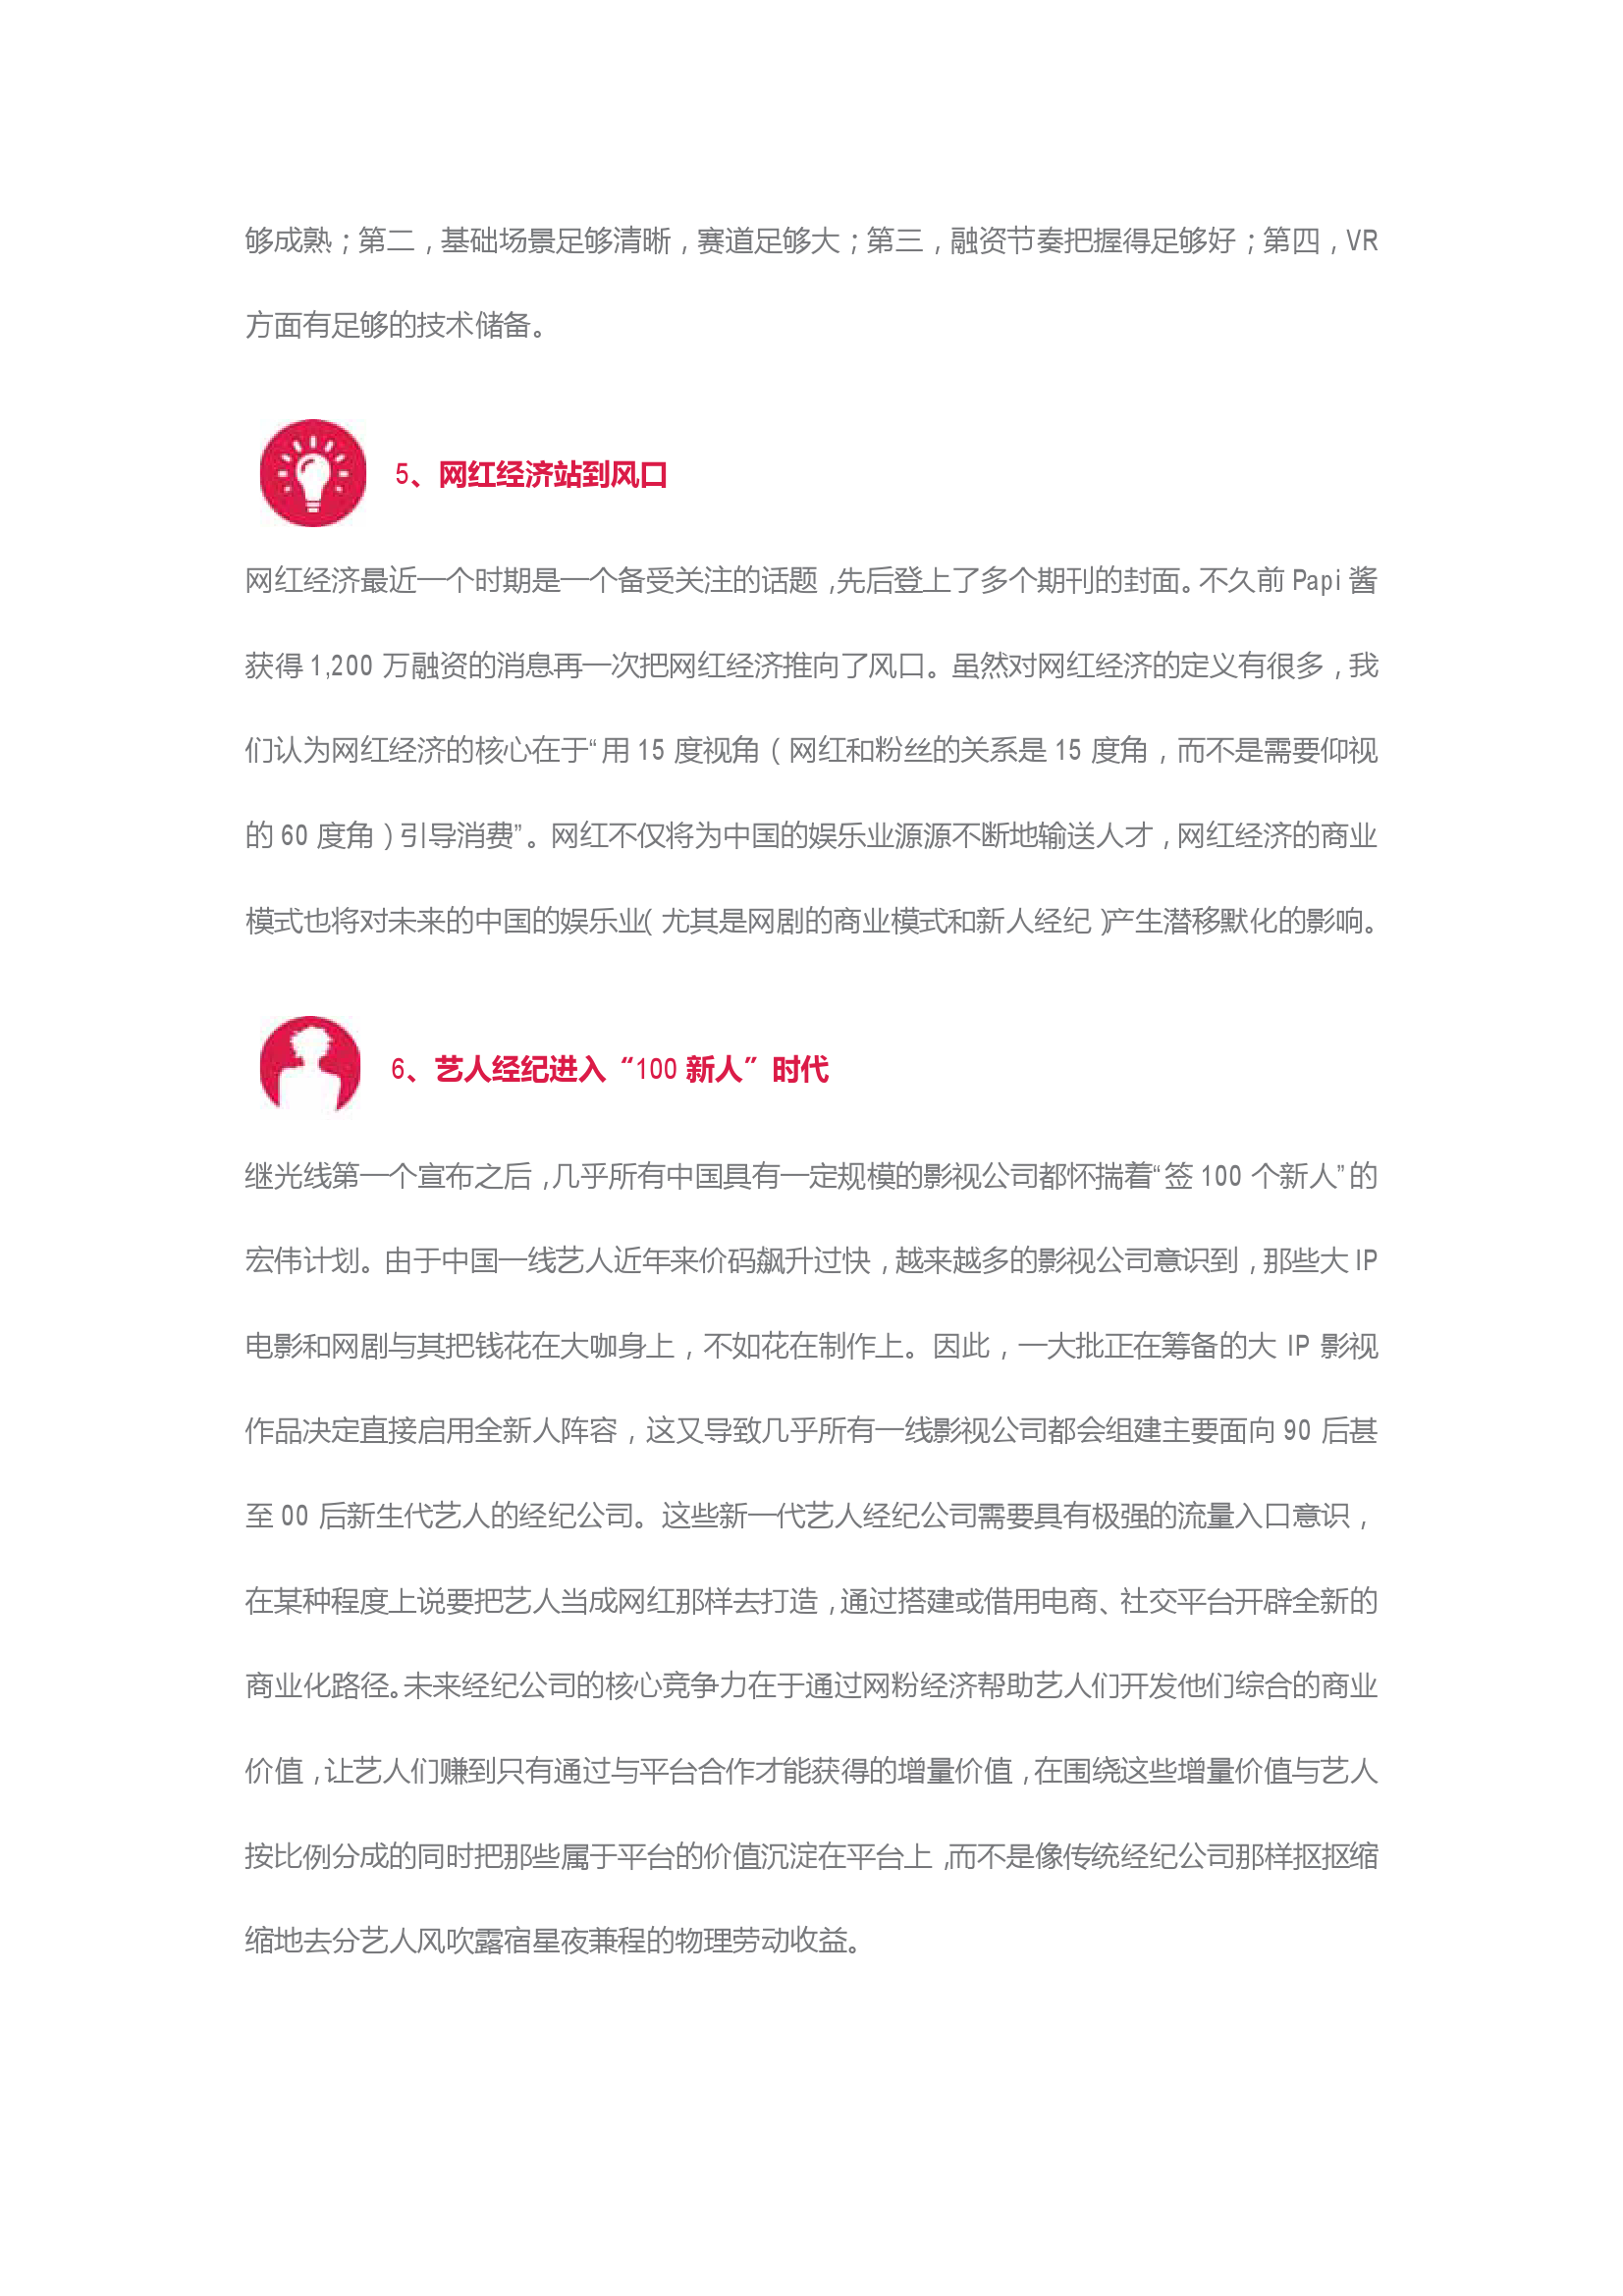 2016Q1中国娱乐产业季度观察_000003